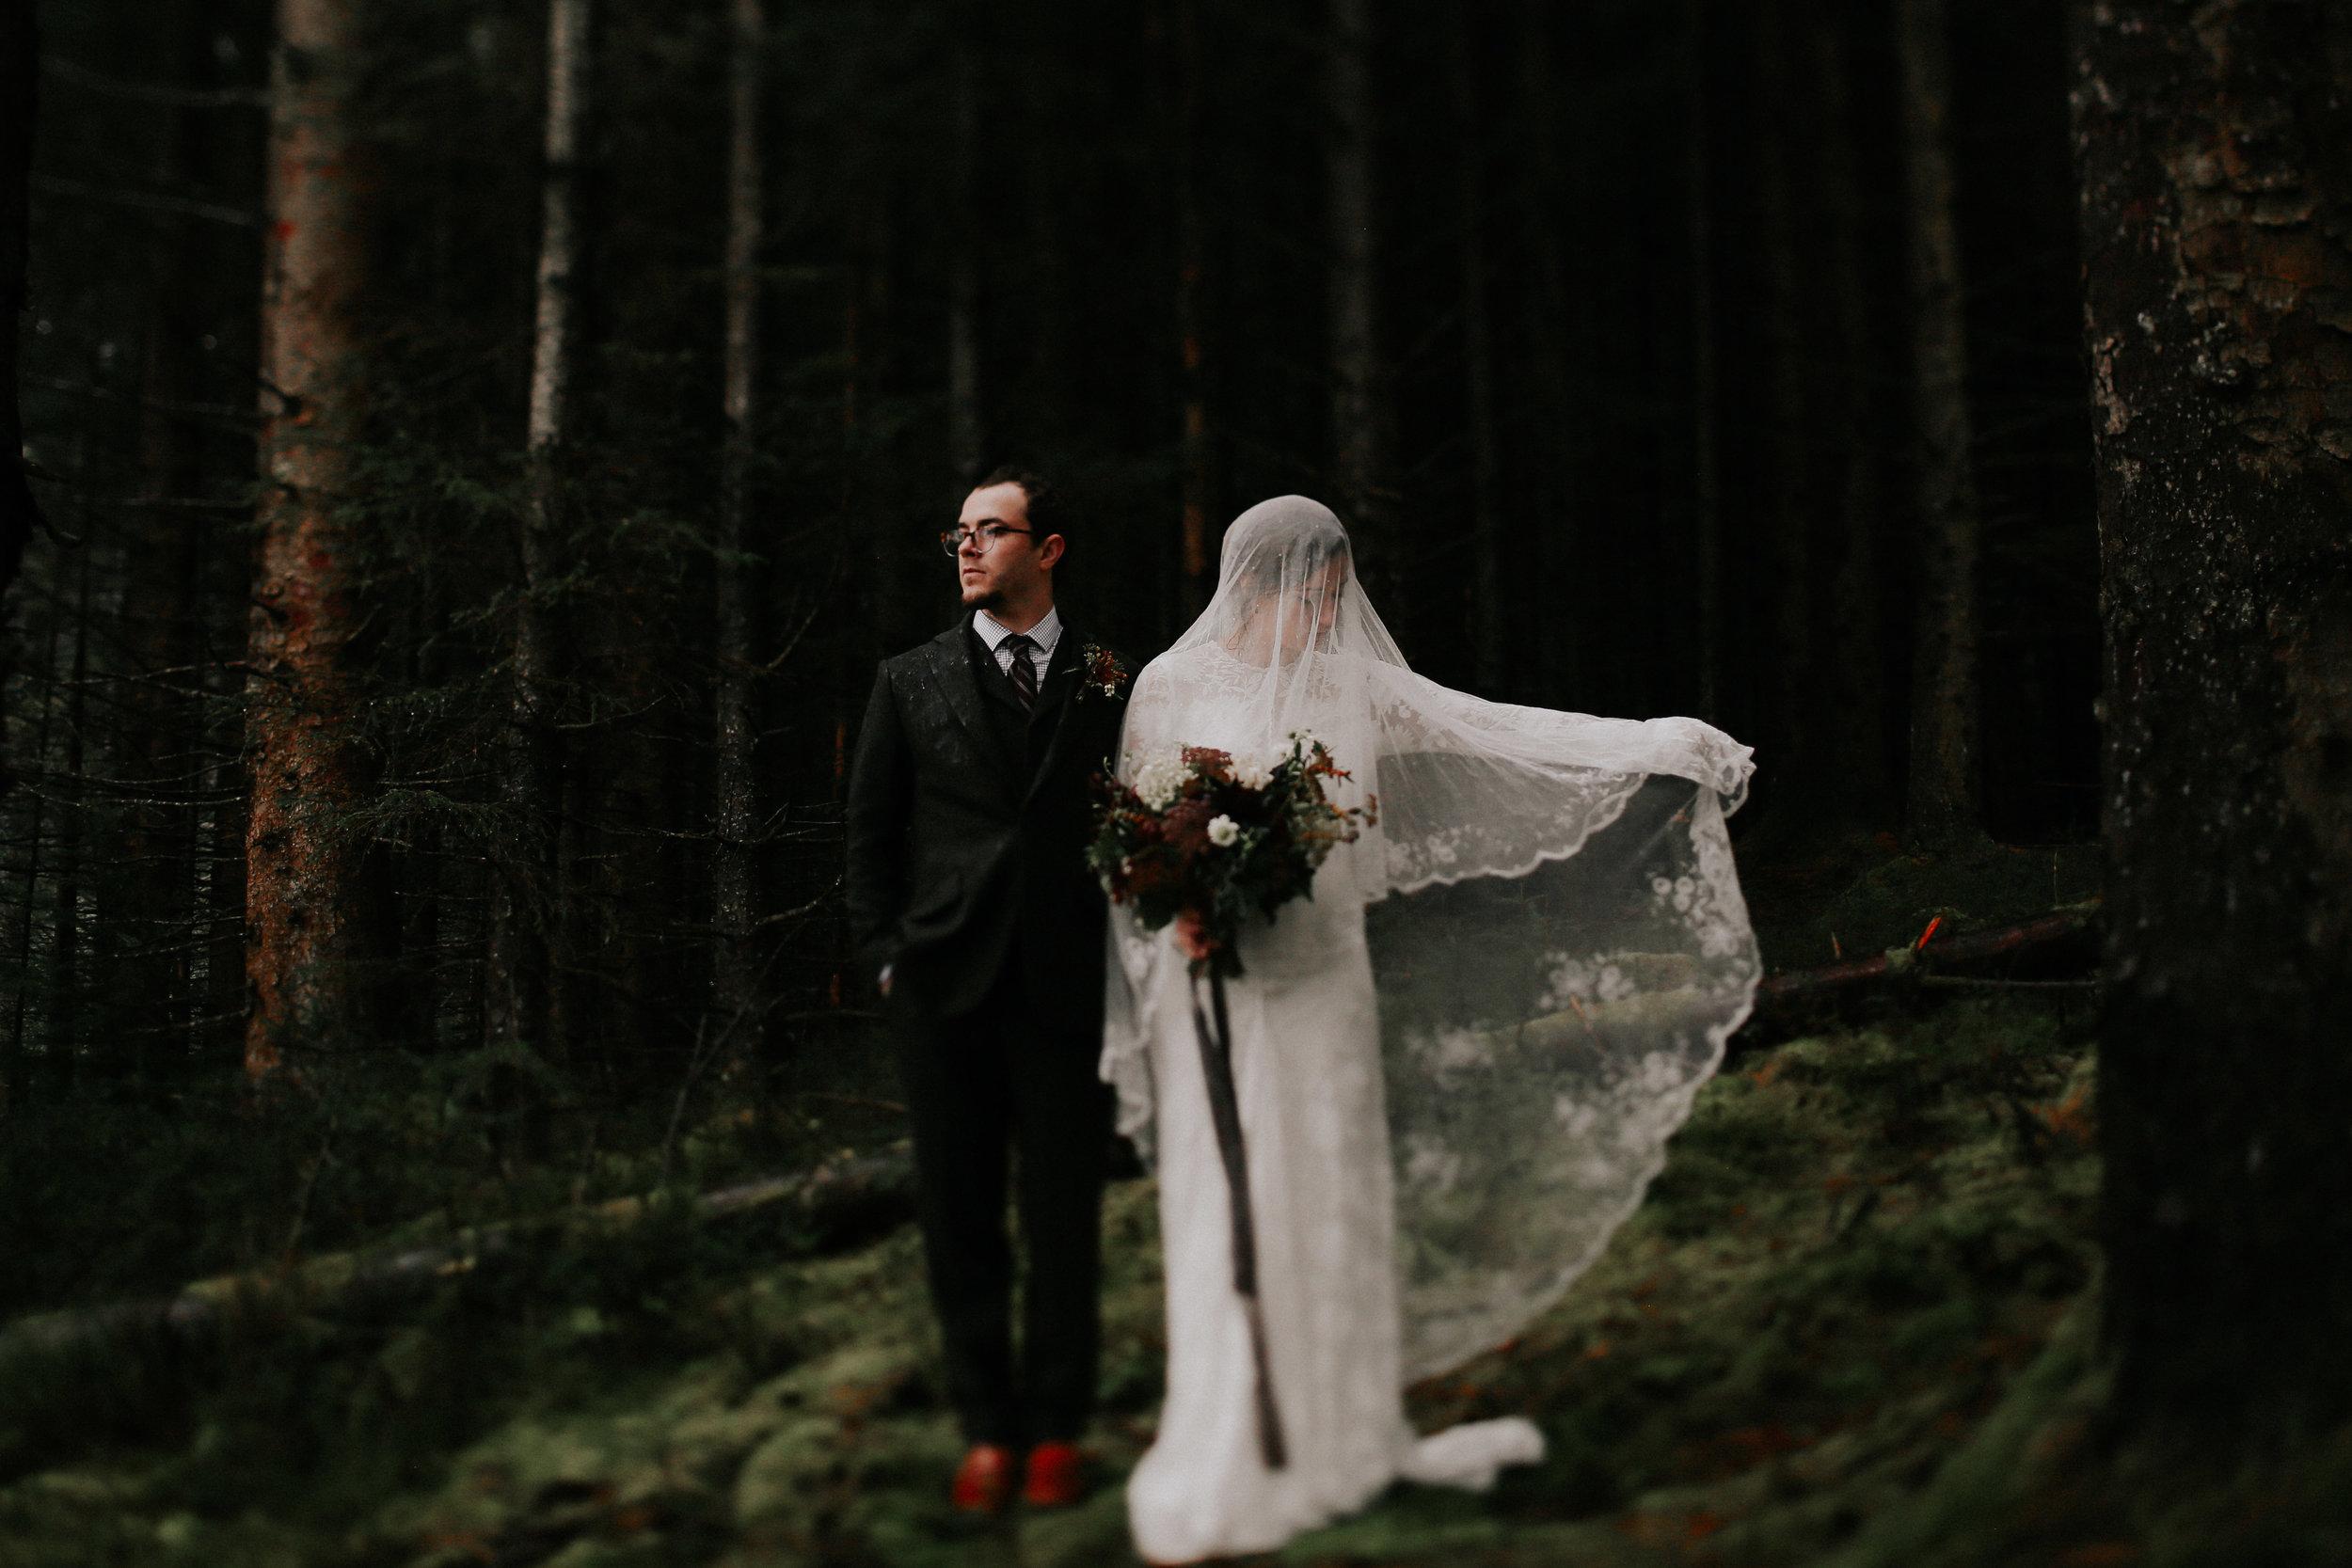 Scotland_Elopement_Melissa_Marshall_Photography_45.jpg